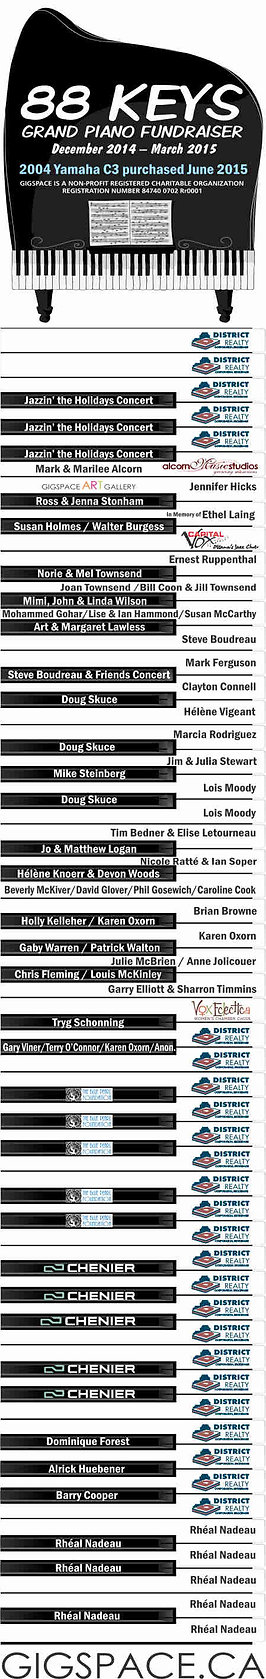 grand piano fundraiser names.jpg